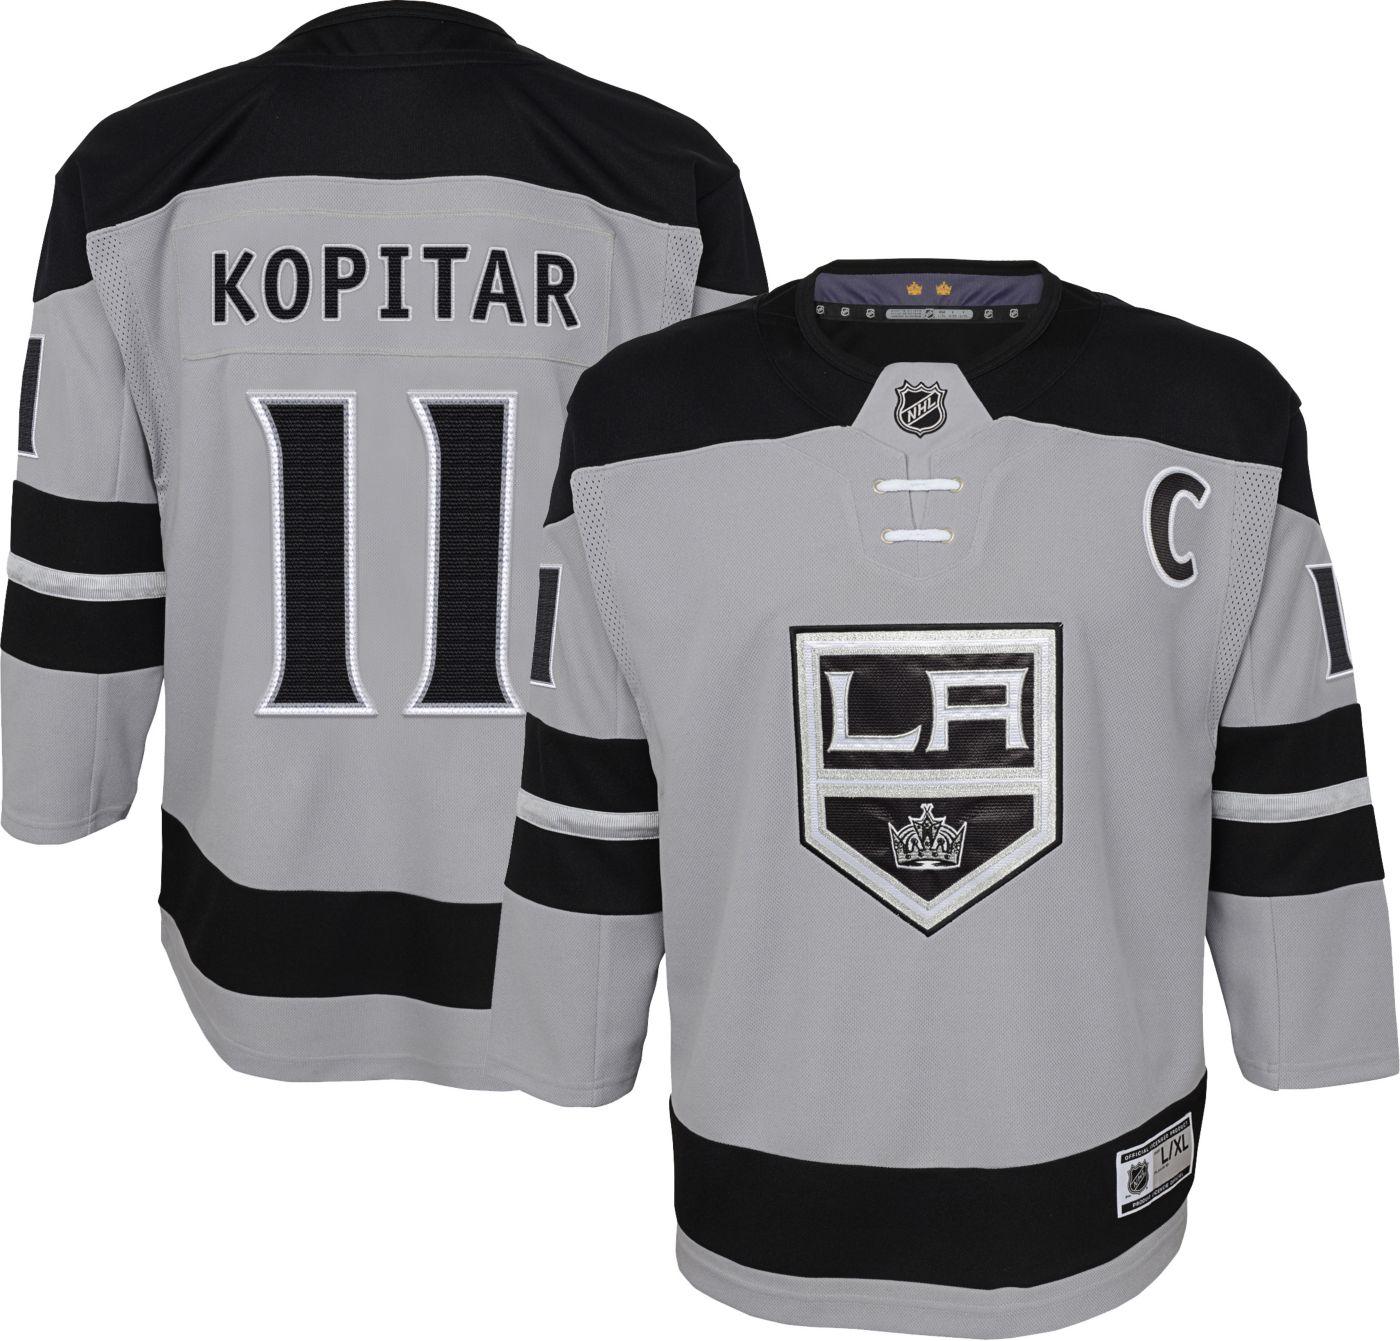 NHL Youth Los Angeles Kings Anze Kopitar #11 Premier Home Jersey